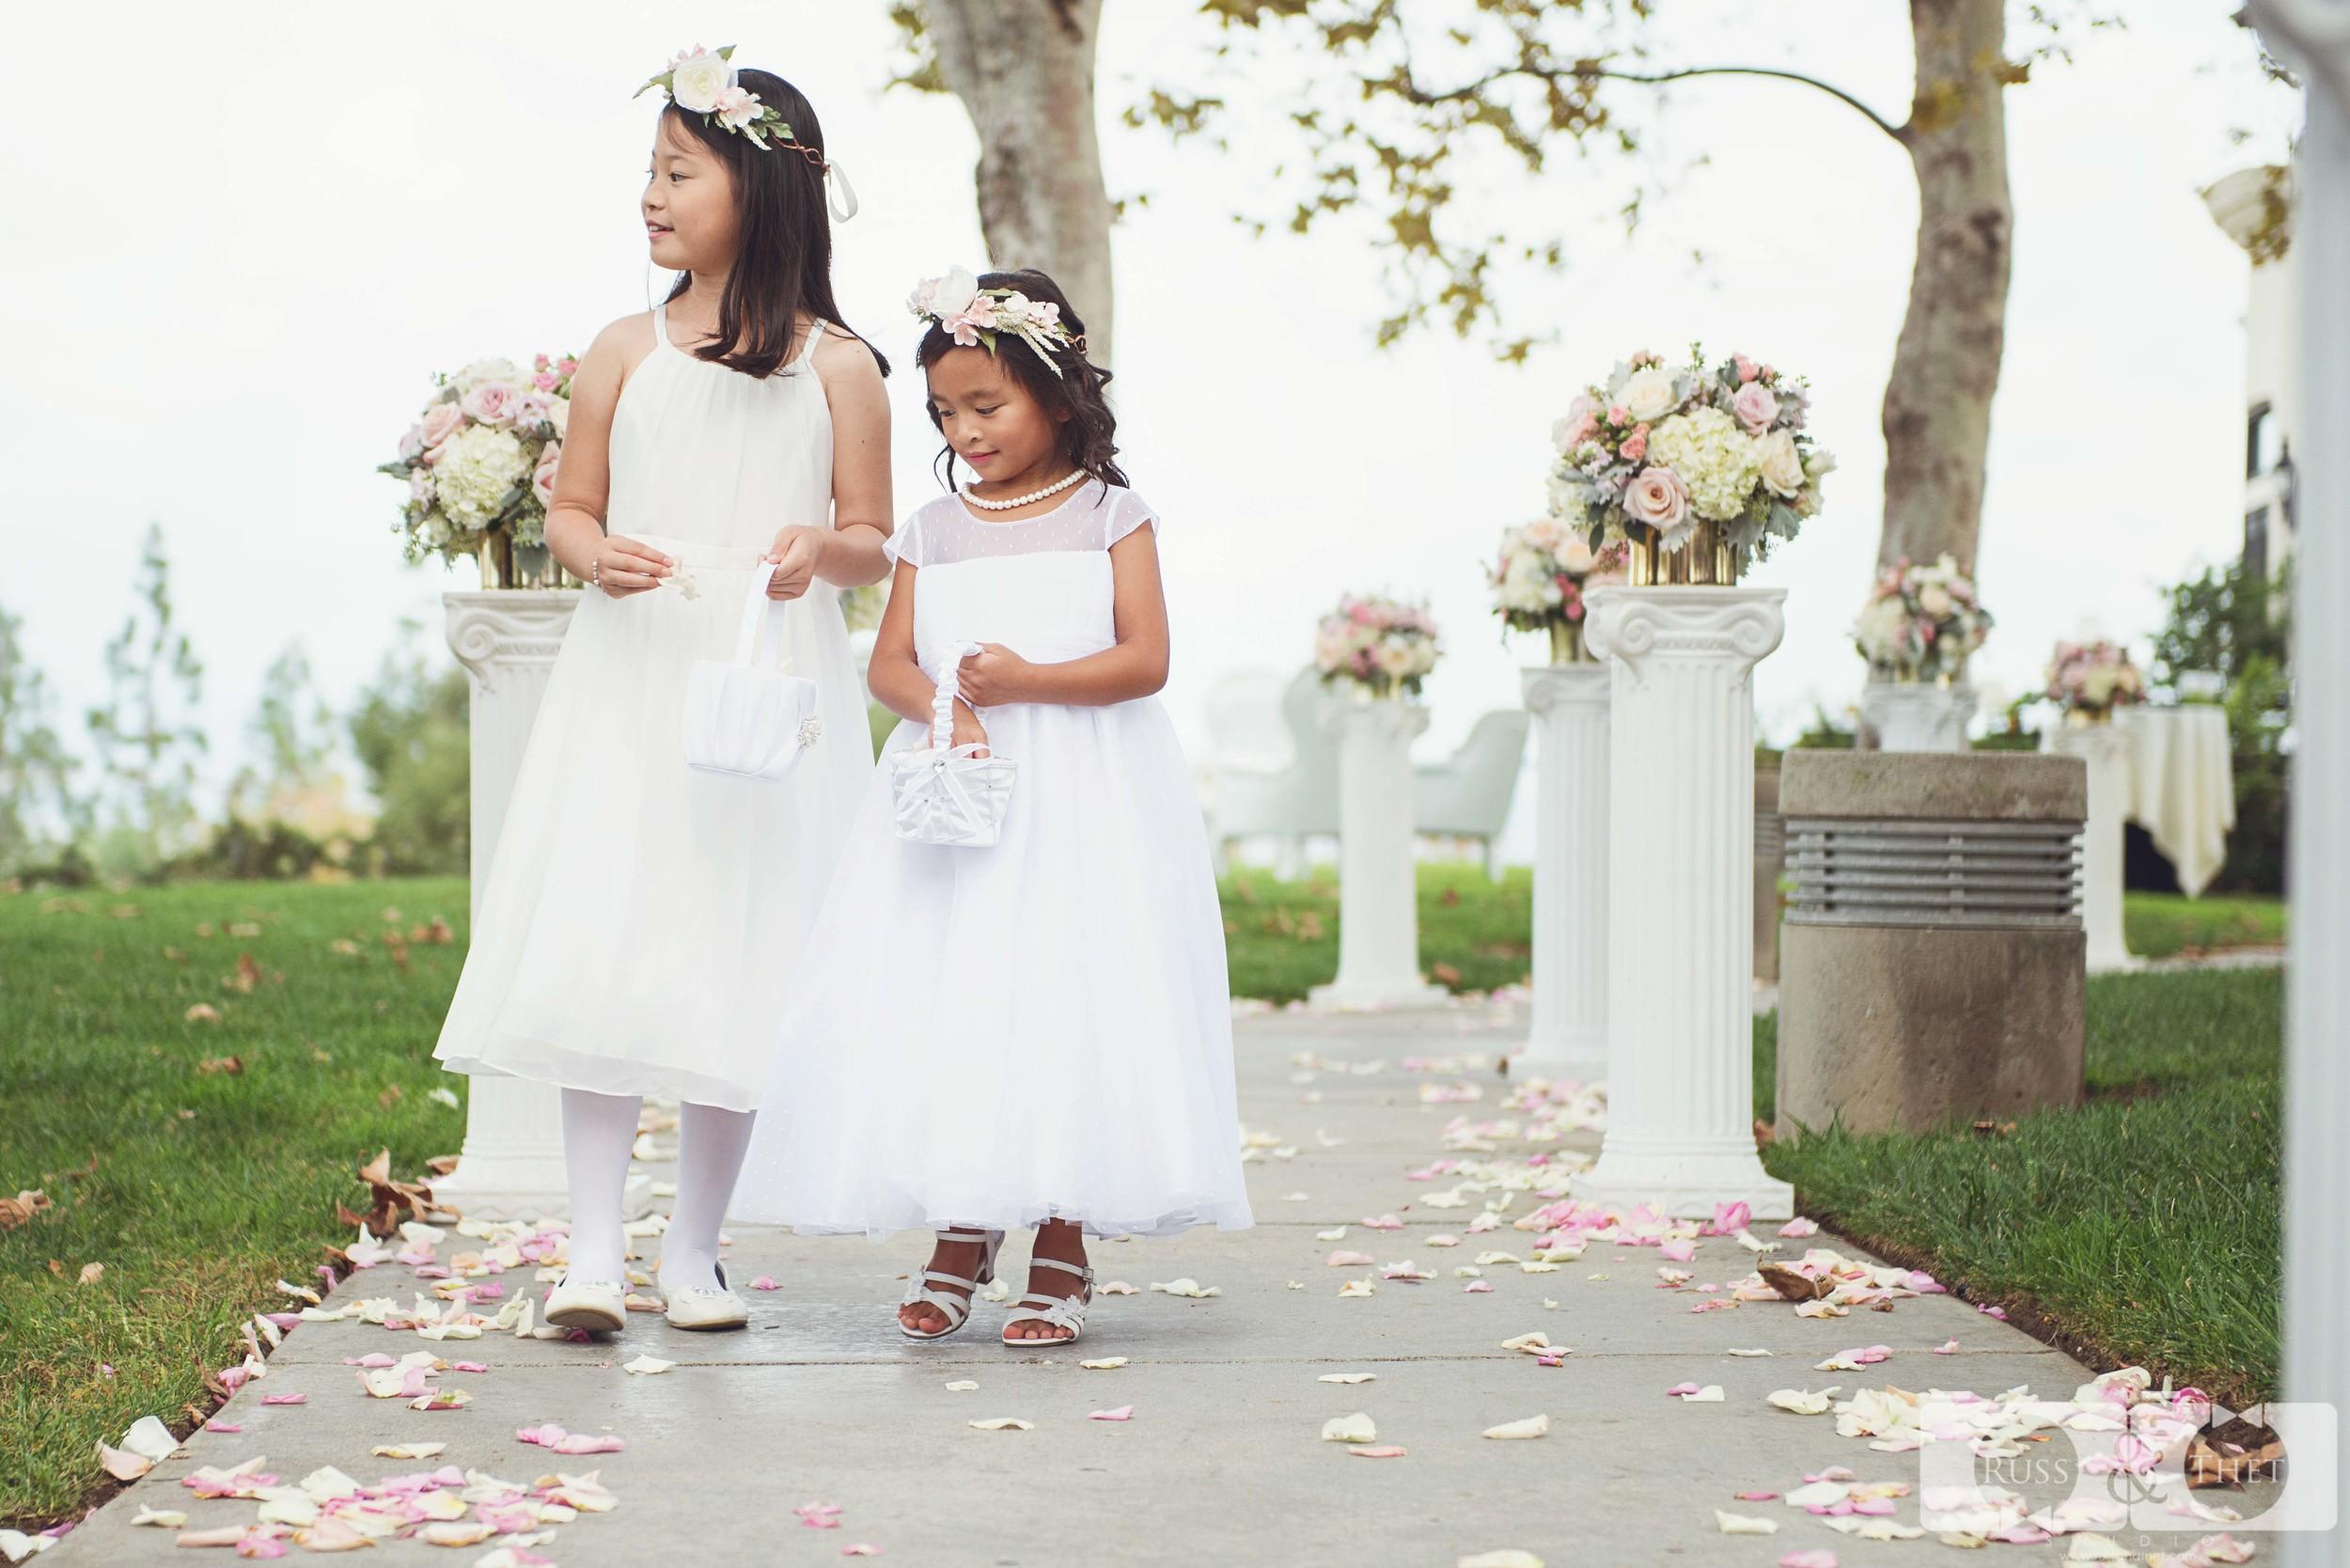 summit-house-fullerton-wedding-photographer-77.JPG